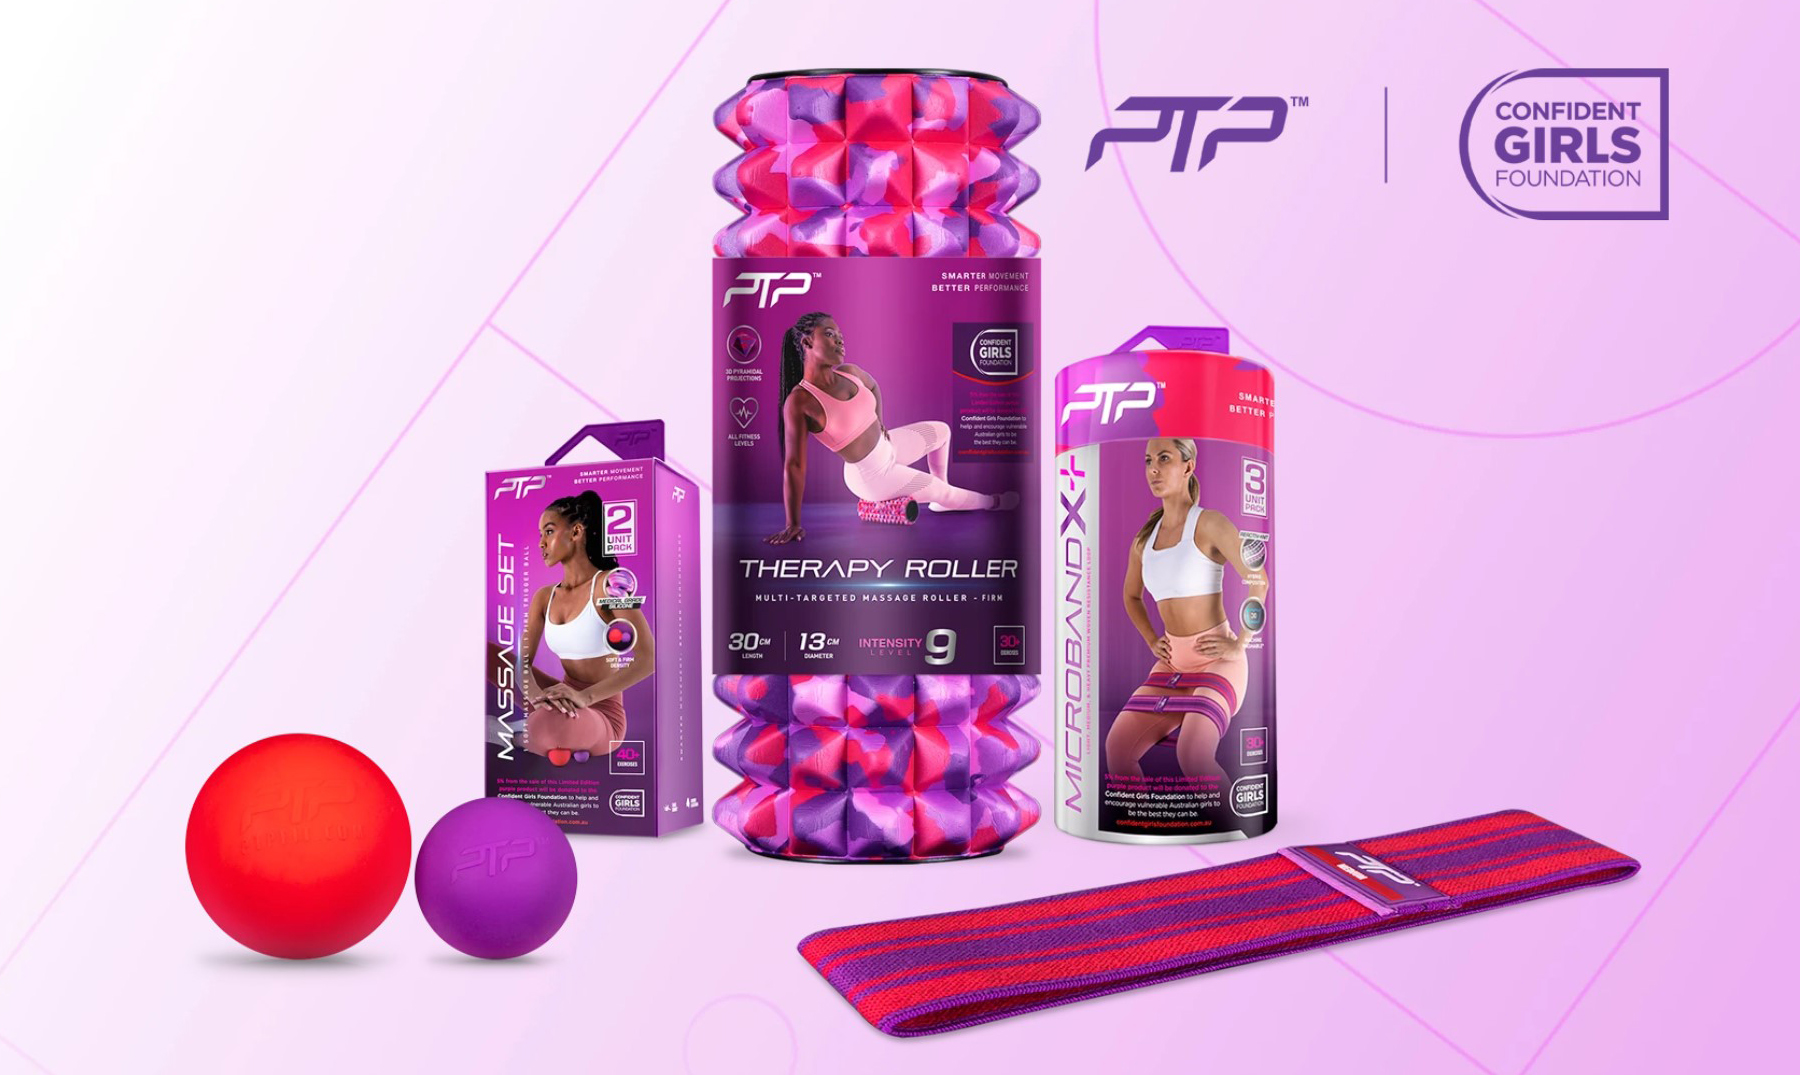 PTP Confident Girls Foundation